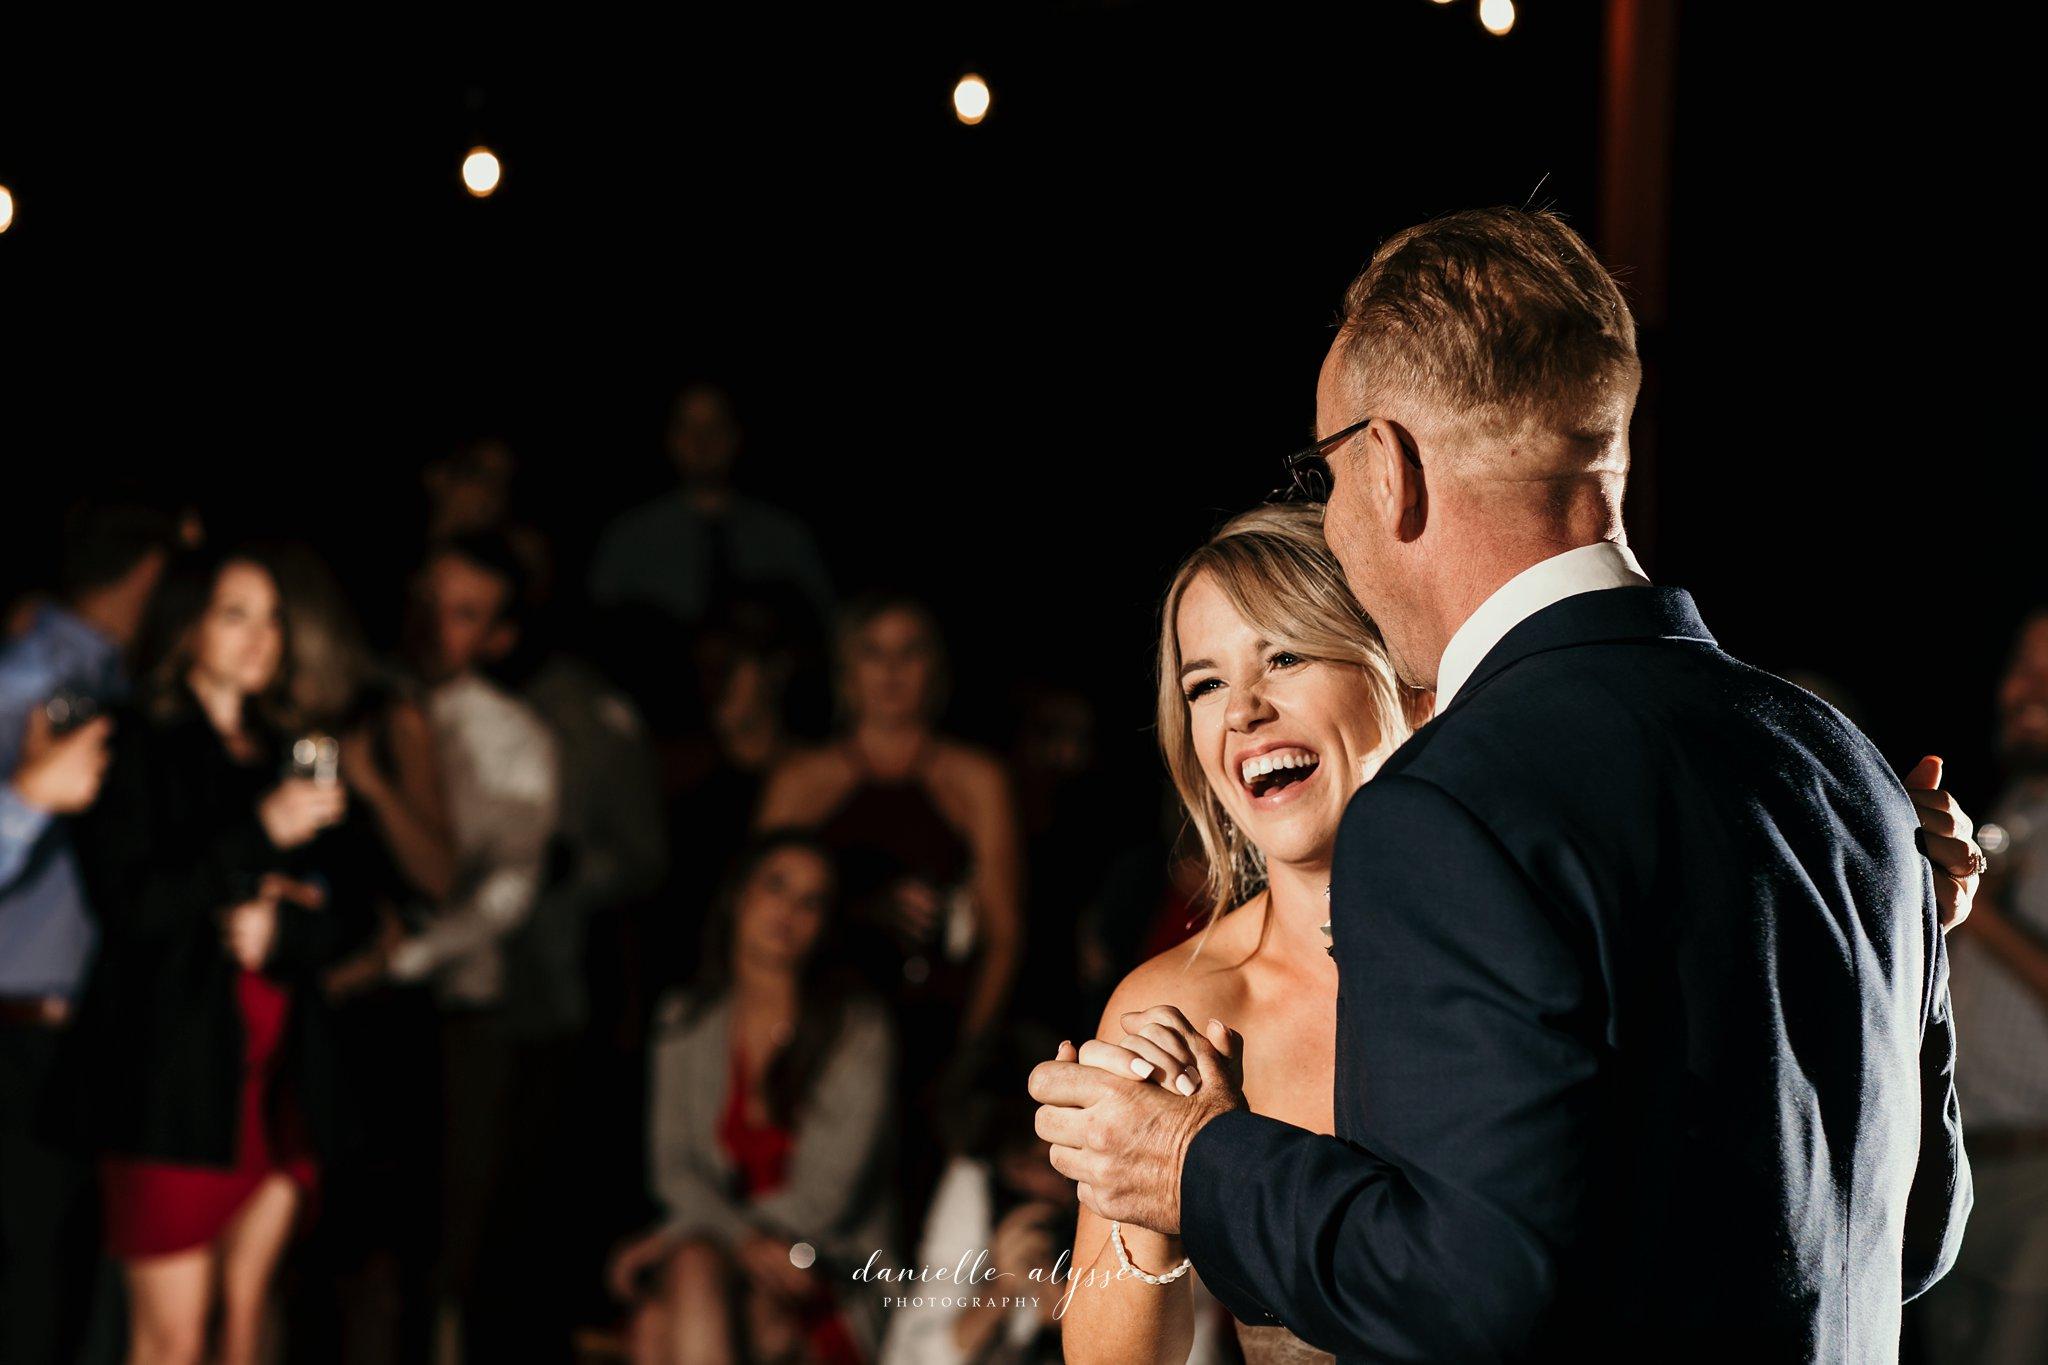 180831_wedding_stephanie_heavenly_south_lake_tahoe_danielle_alysse_photography_destination_blog_1193_WEB.jpg